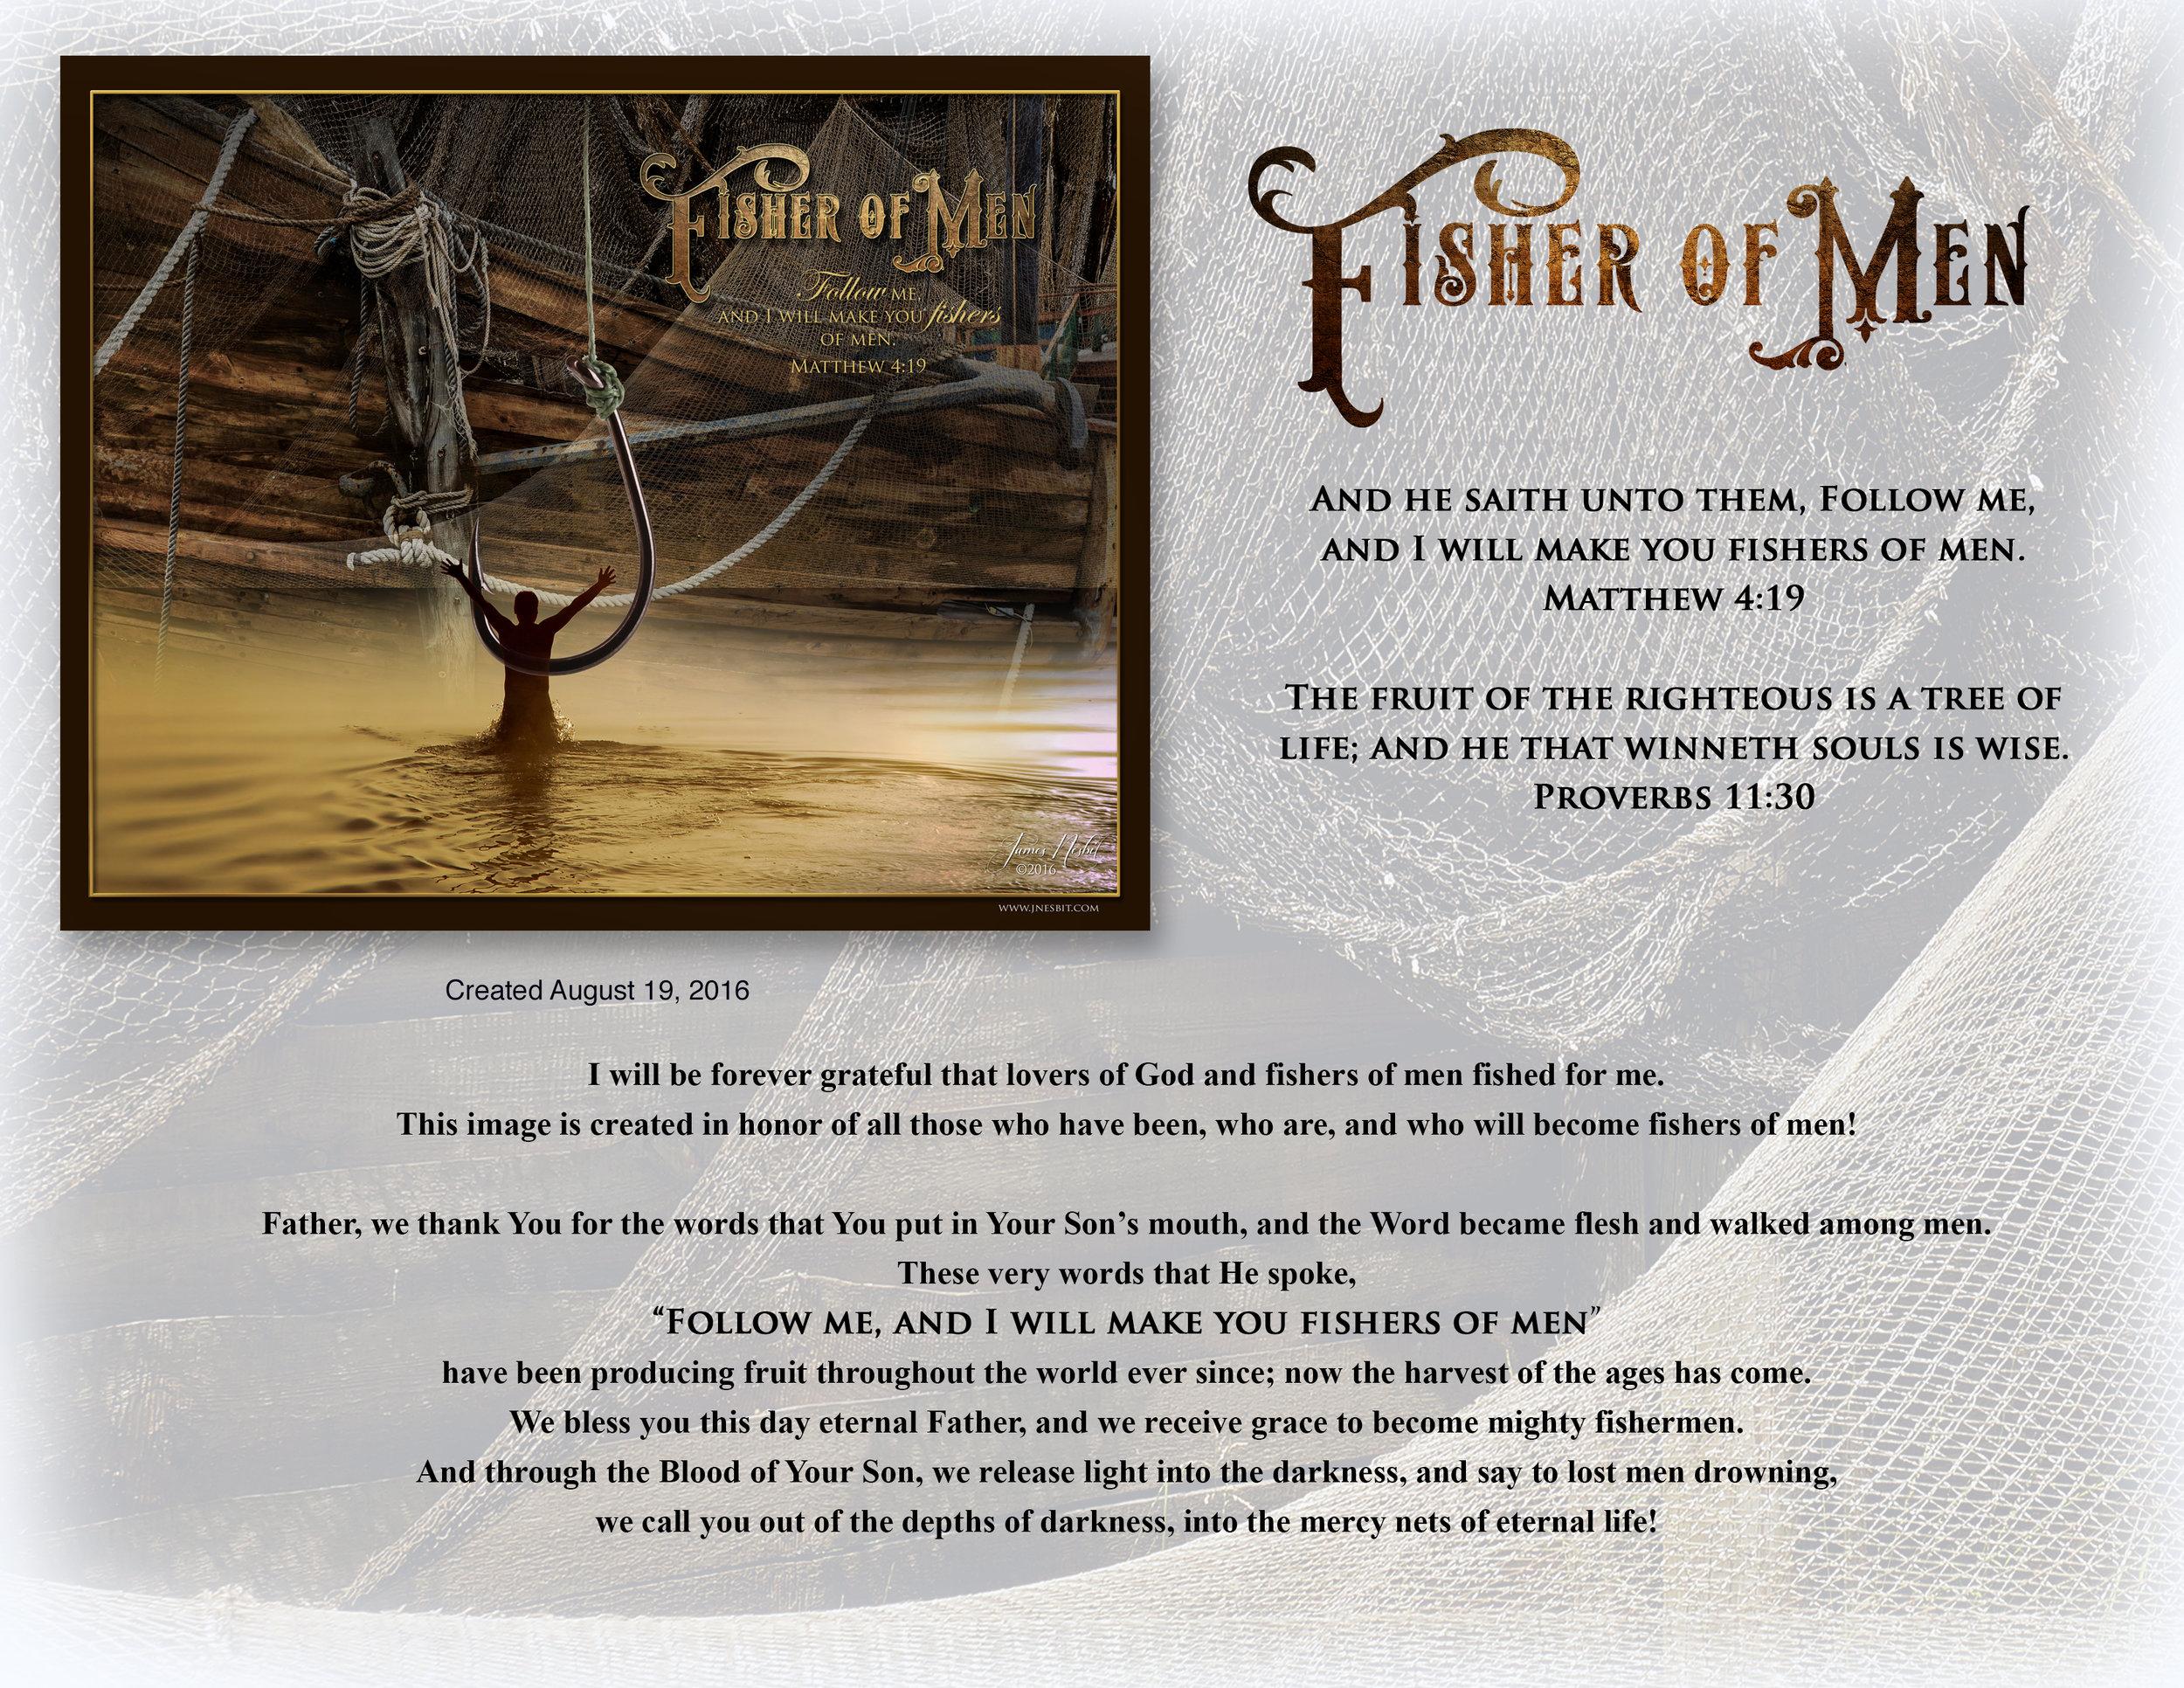 Fisher of Men Description  copy.jpg